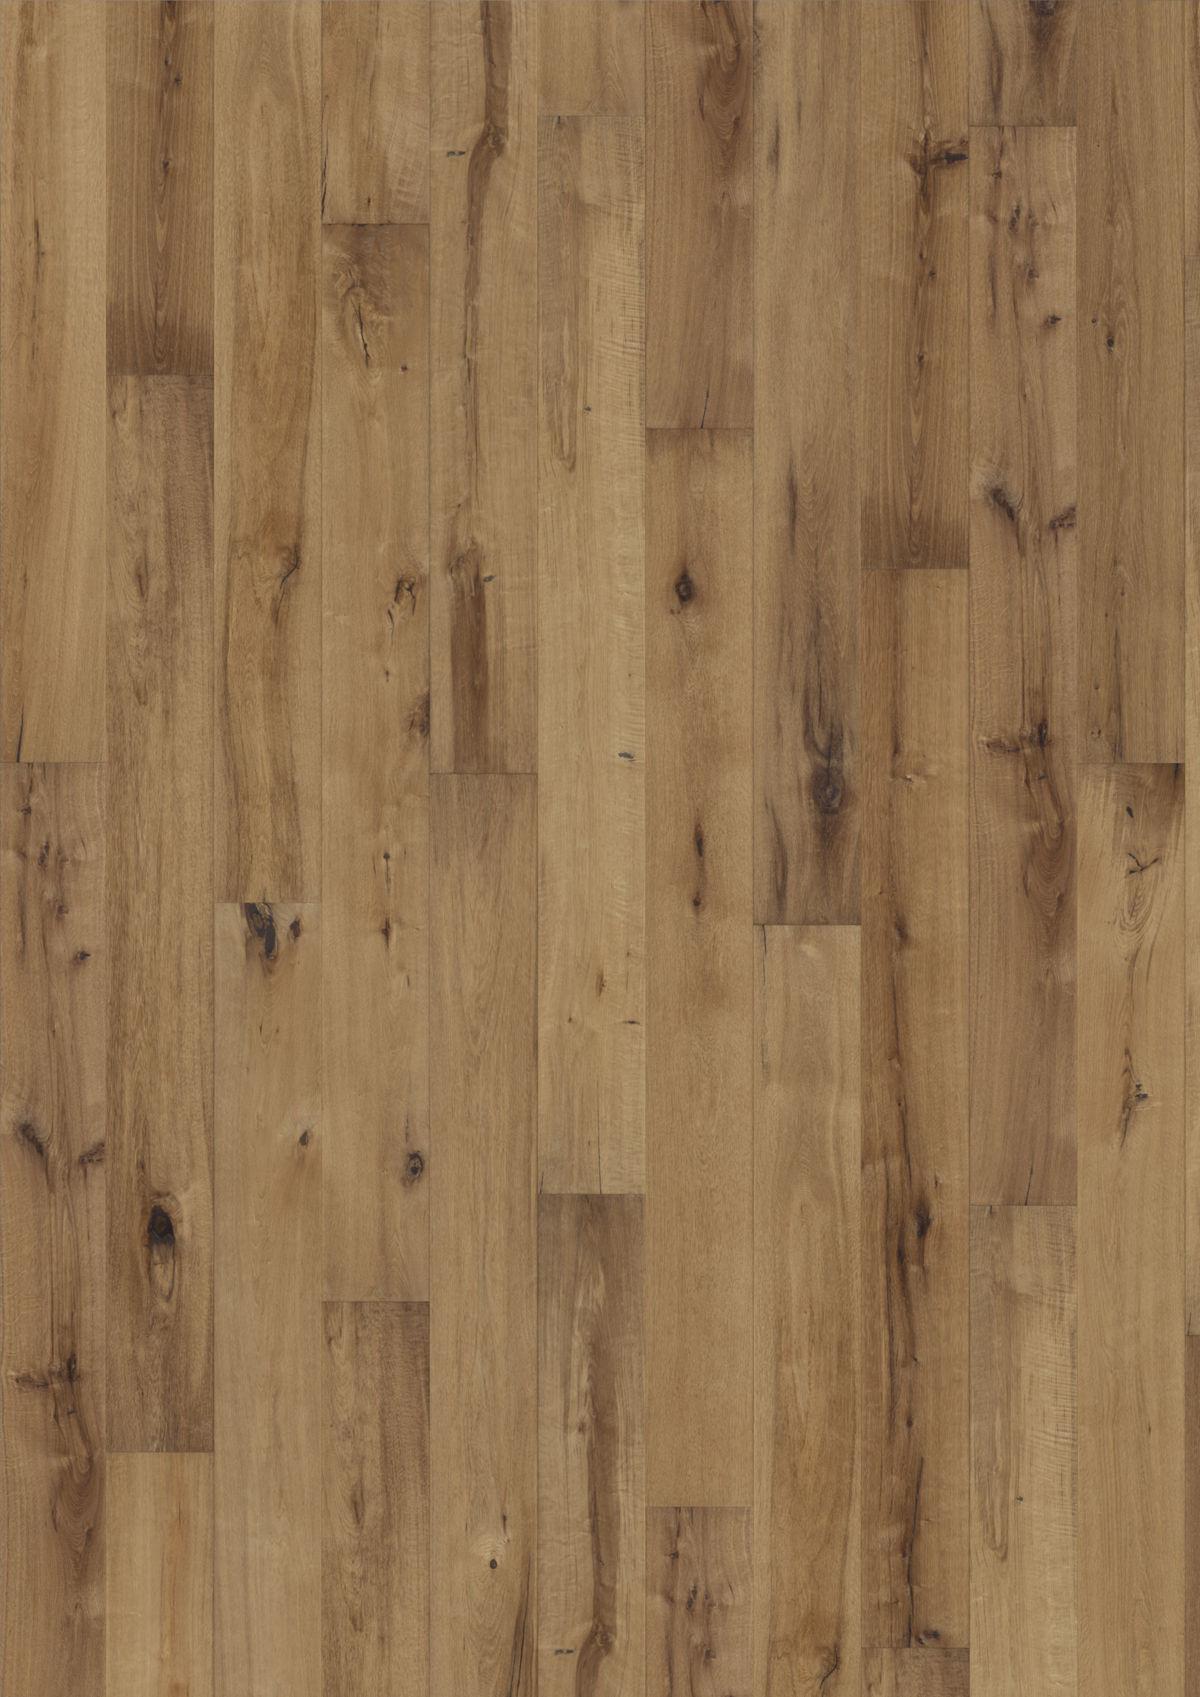 Kahrs Artisan Oak Straw Engineered Wood Flooring